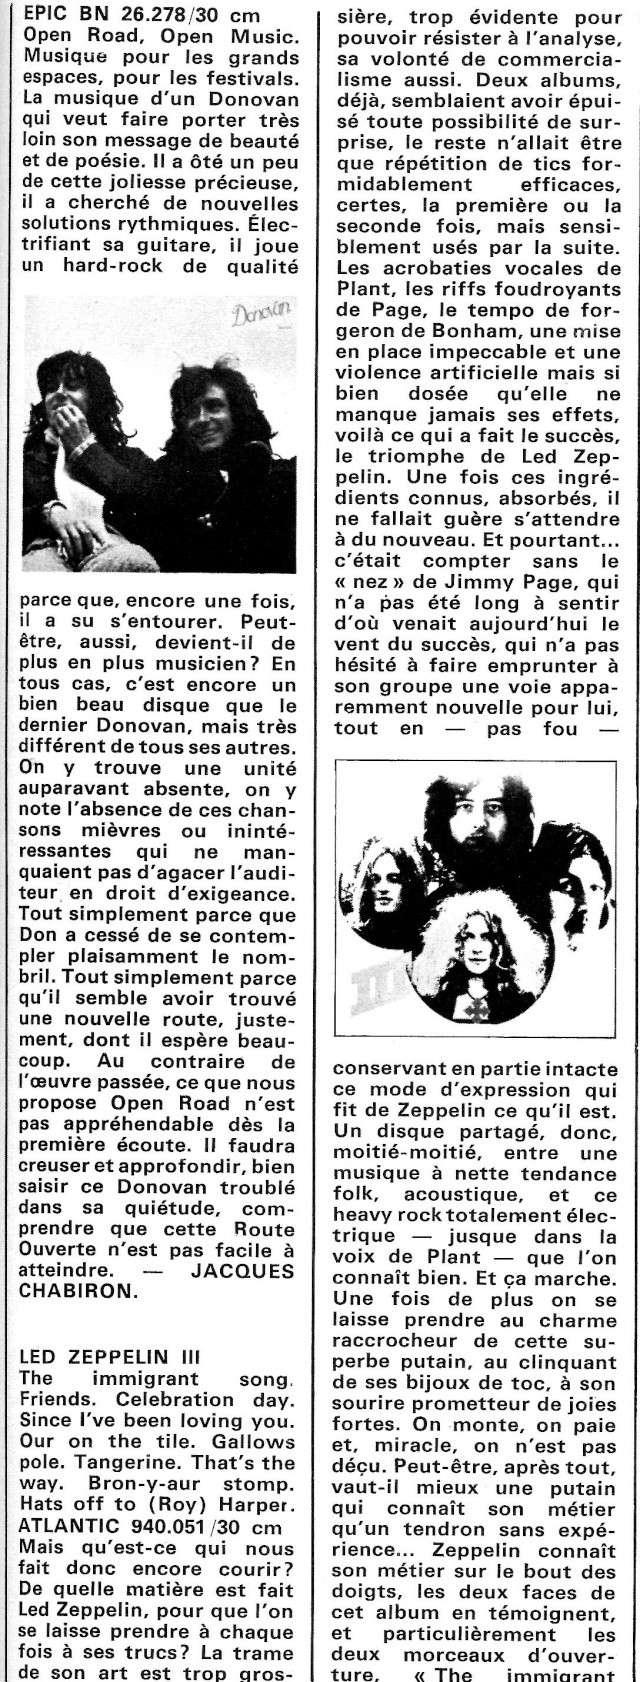 Led Zeppelin III (1970) R45-0922